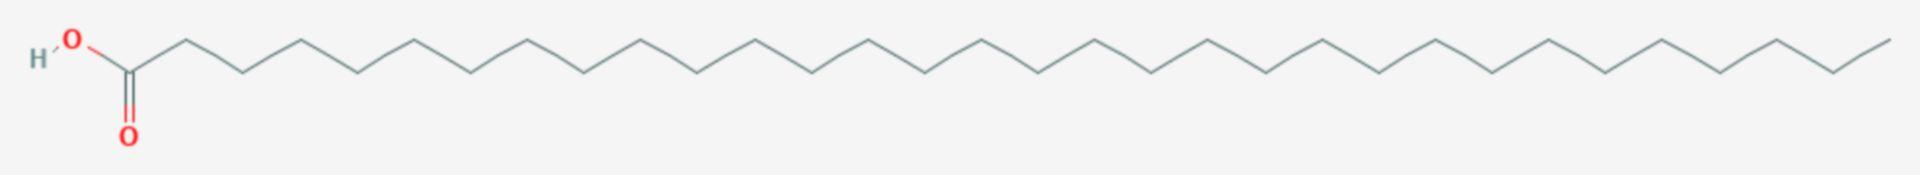 Laccersäure (Strukturformel)